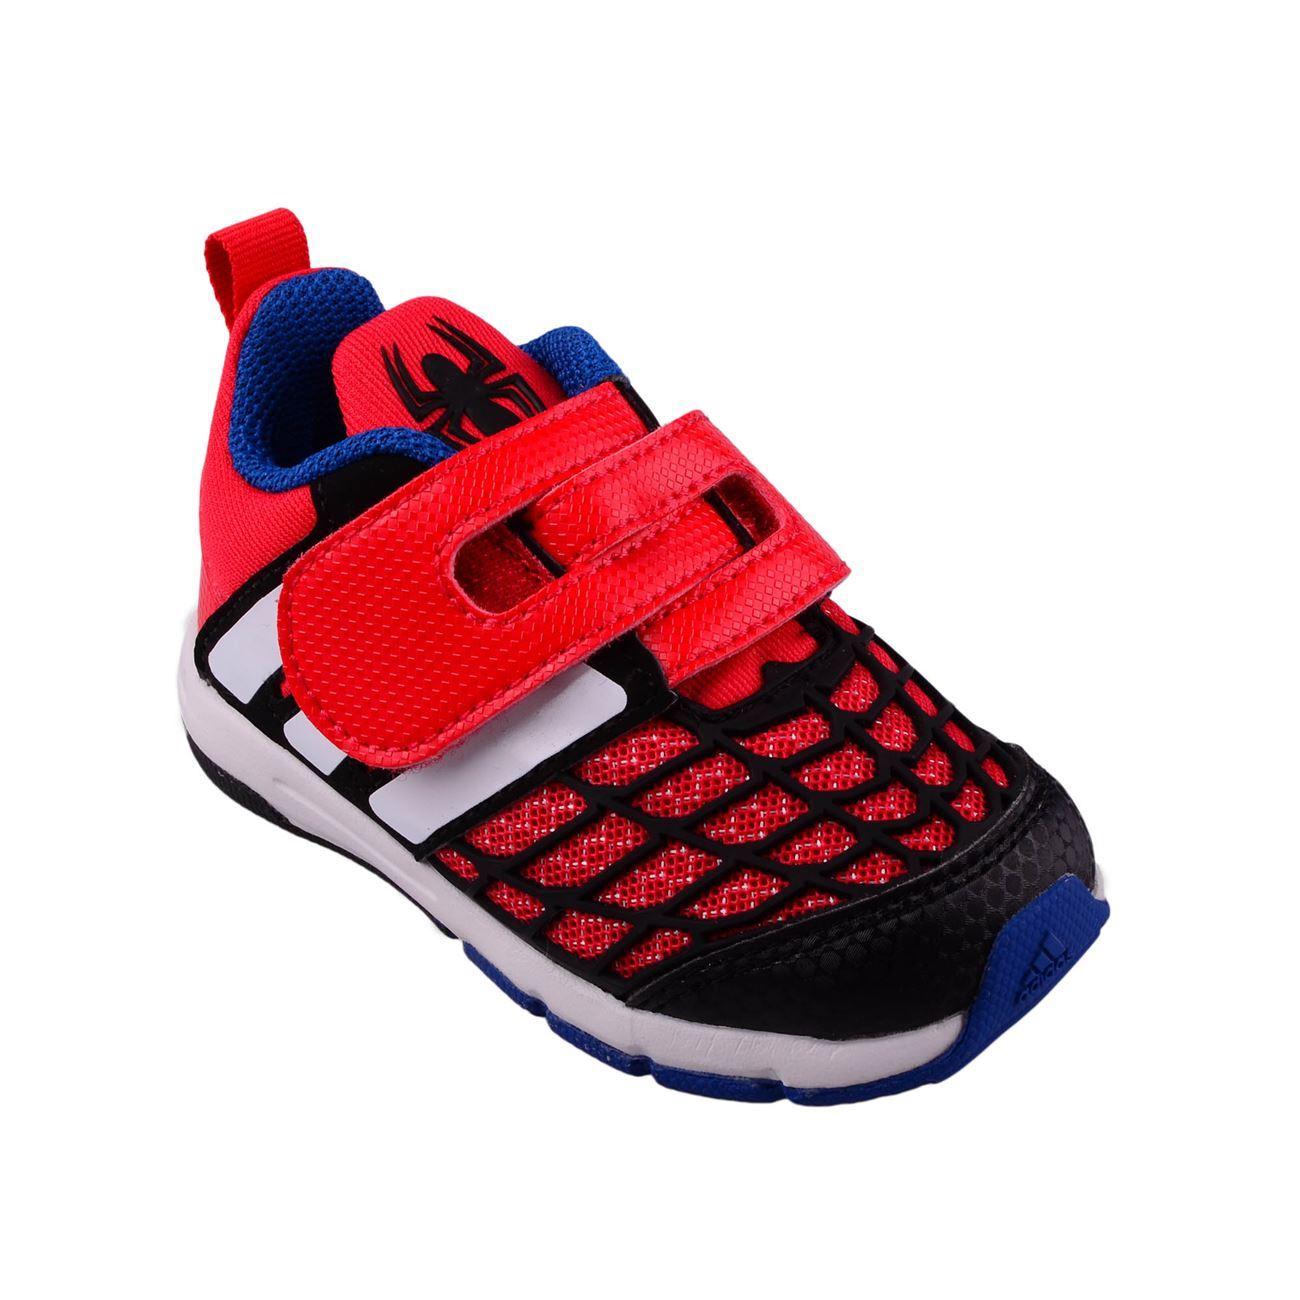 f69c7b093362ee ... adidas Disney Spiderman Cloudfoam Trainers Infants Rd Blk Sneakers  Marvel Comics ...